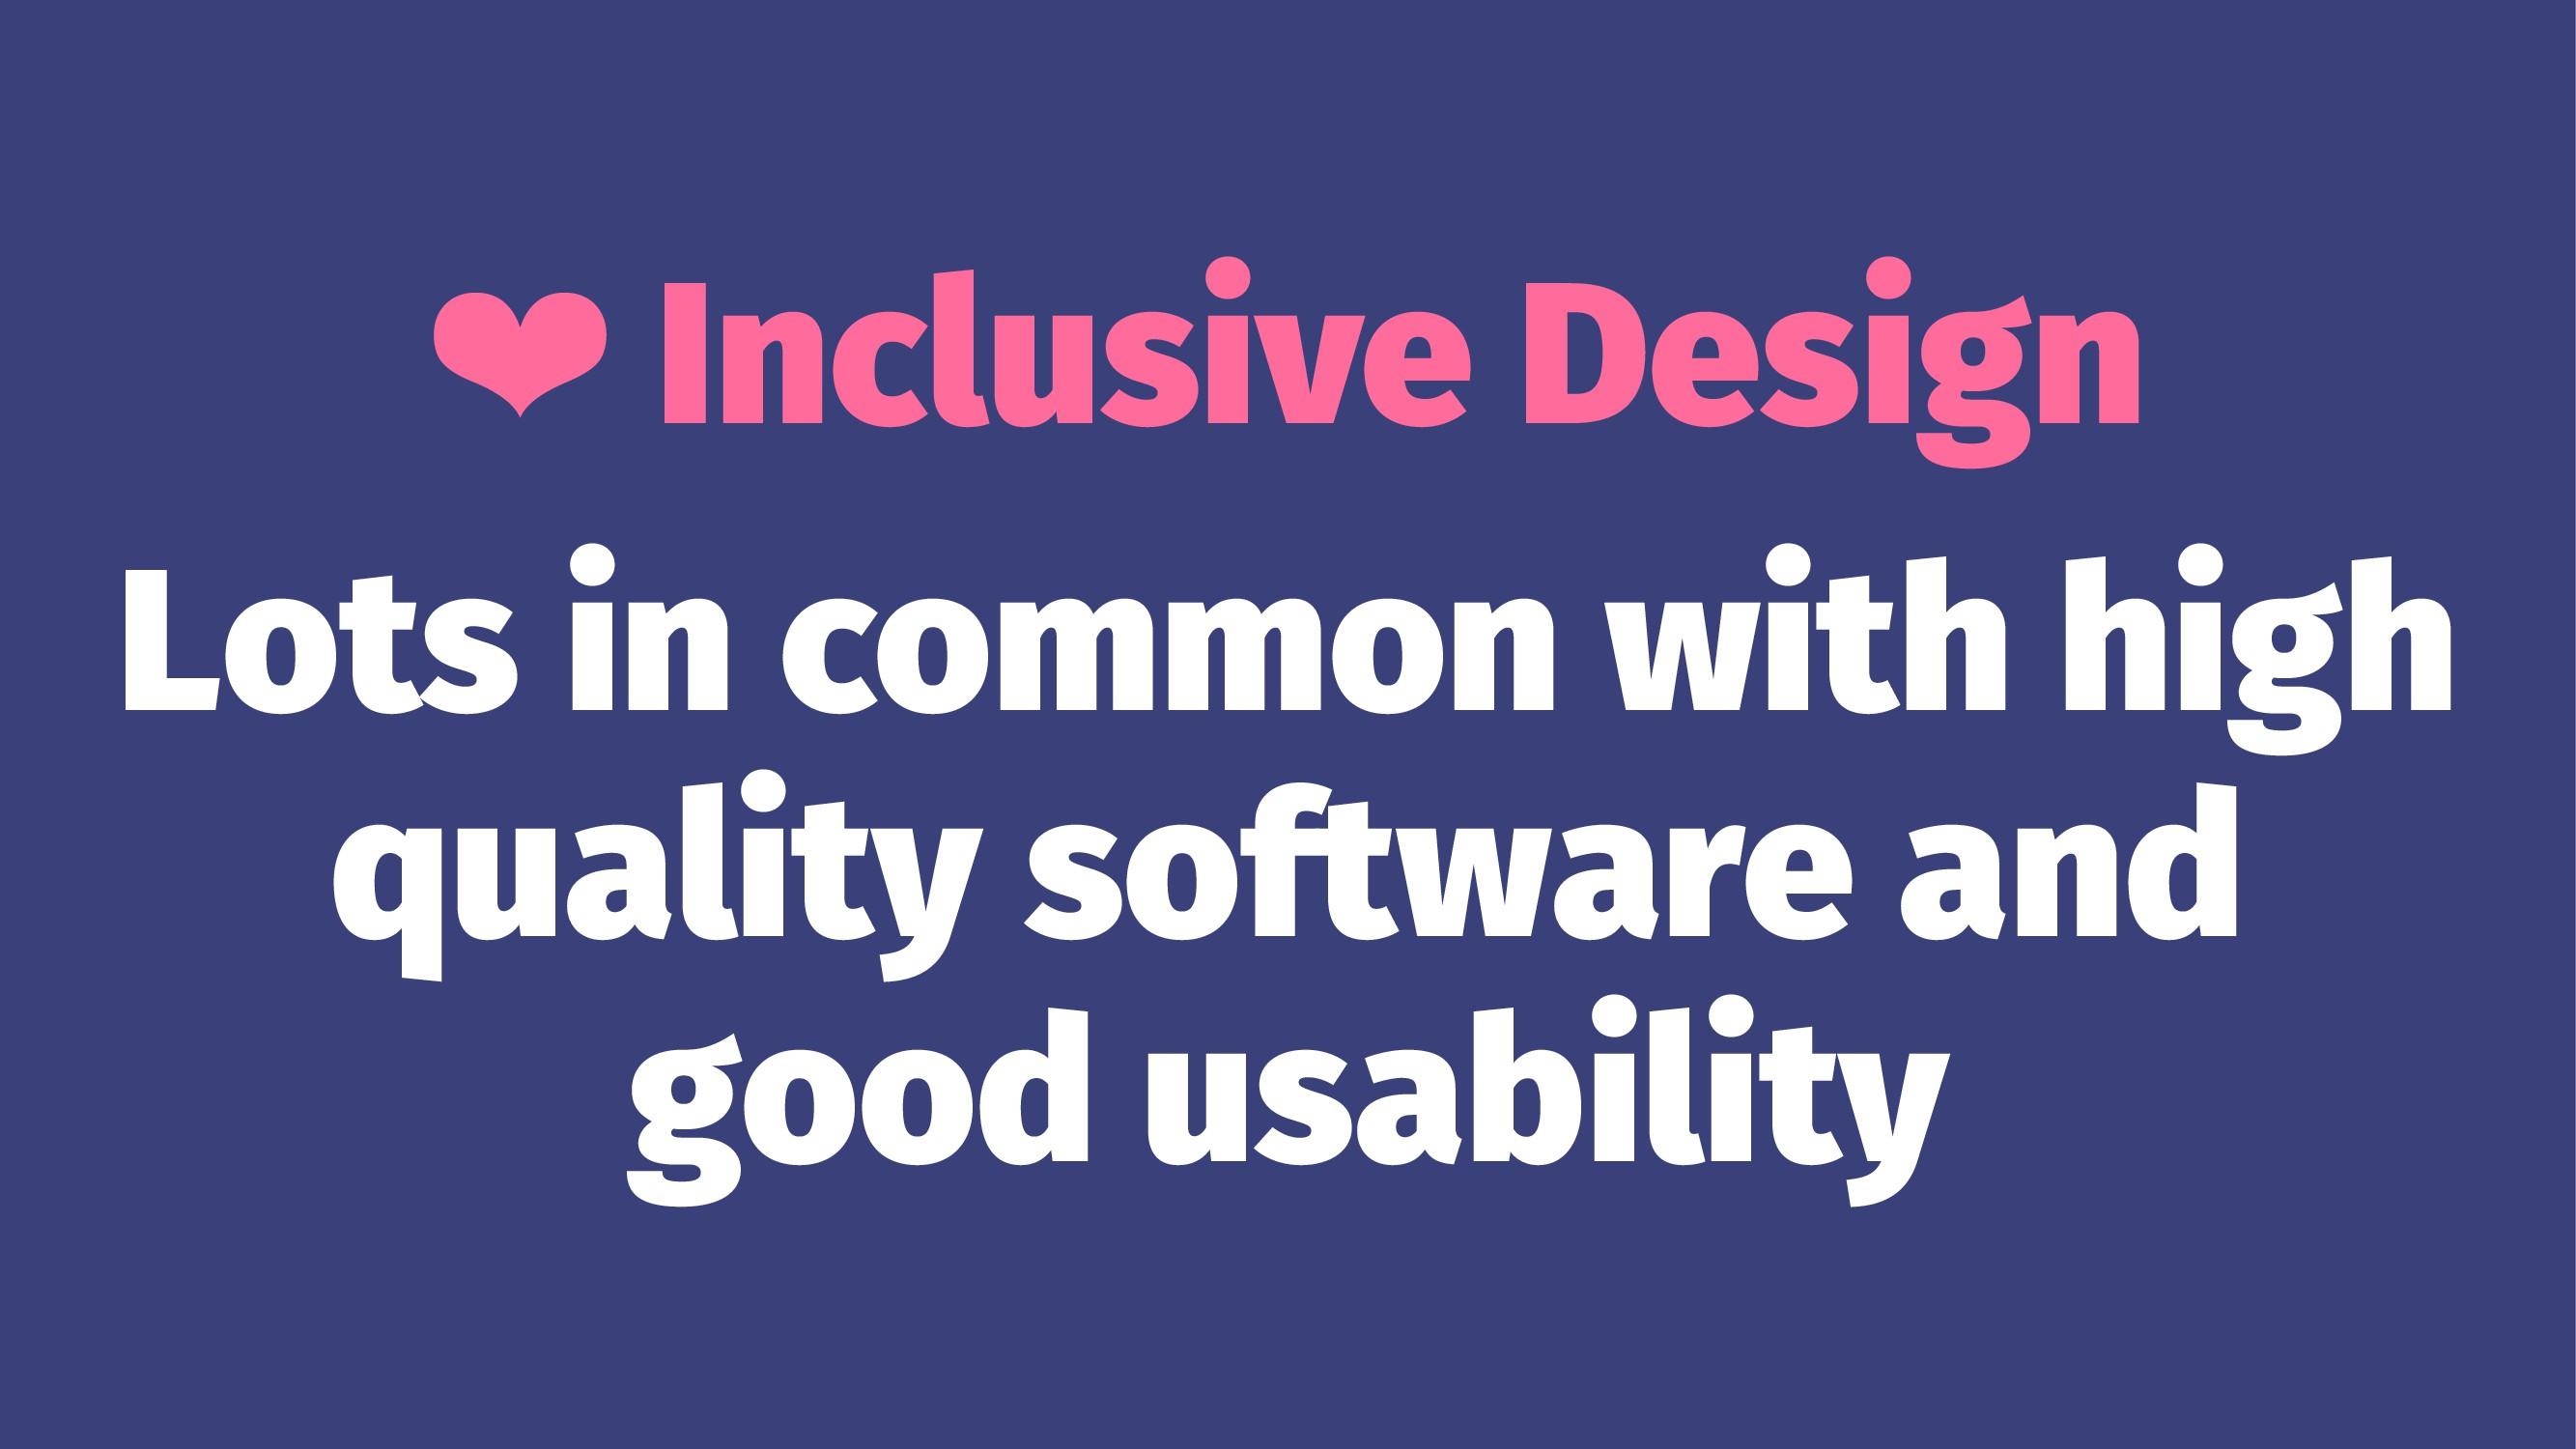 ❤ Inclusive Design Lots in common with high qua...